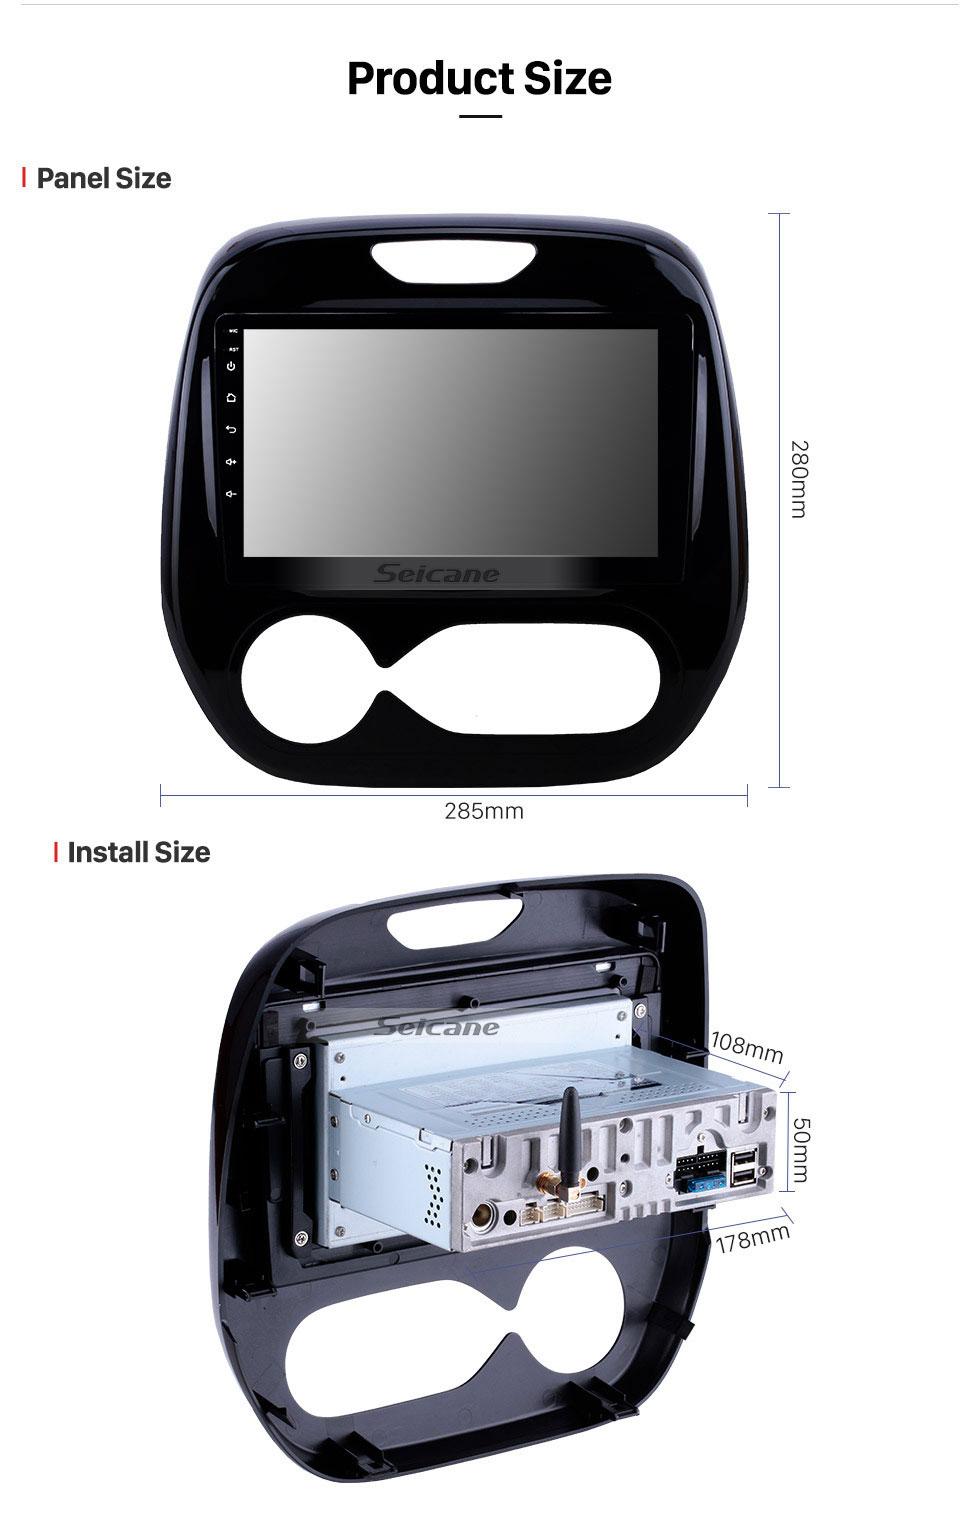 Seicane 9 Zoll 2011-2016 Renault Captur CLIO Samsung QM3 auto A / C Aftermarket GPS Navigationssystem HD Touchscreen Autoradio Bluetooth Unterstützung OBD2 4G WiFi DVR Mirror Link